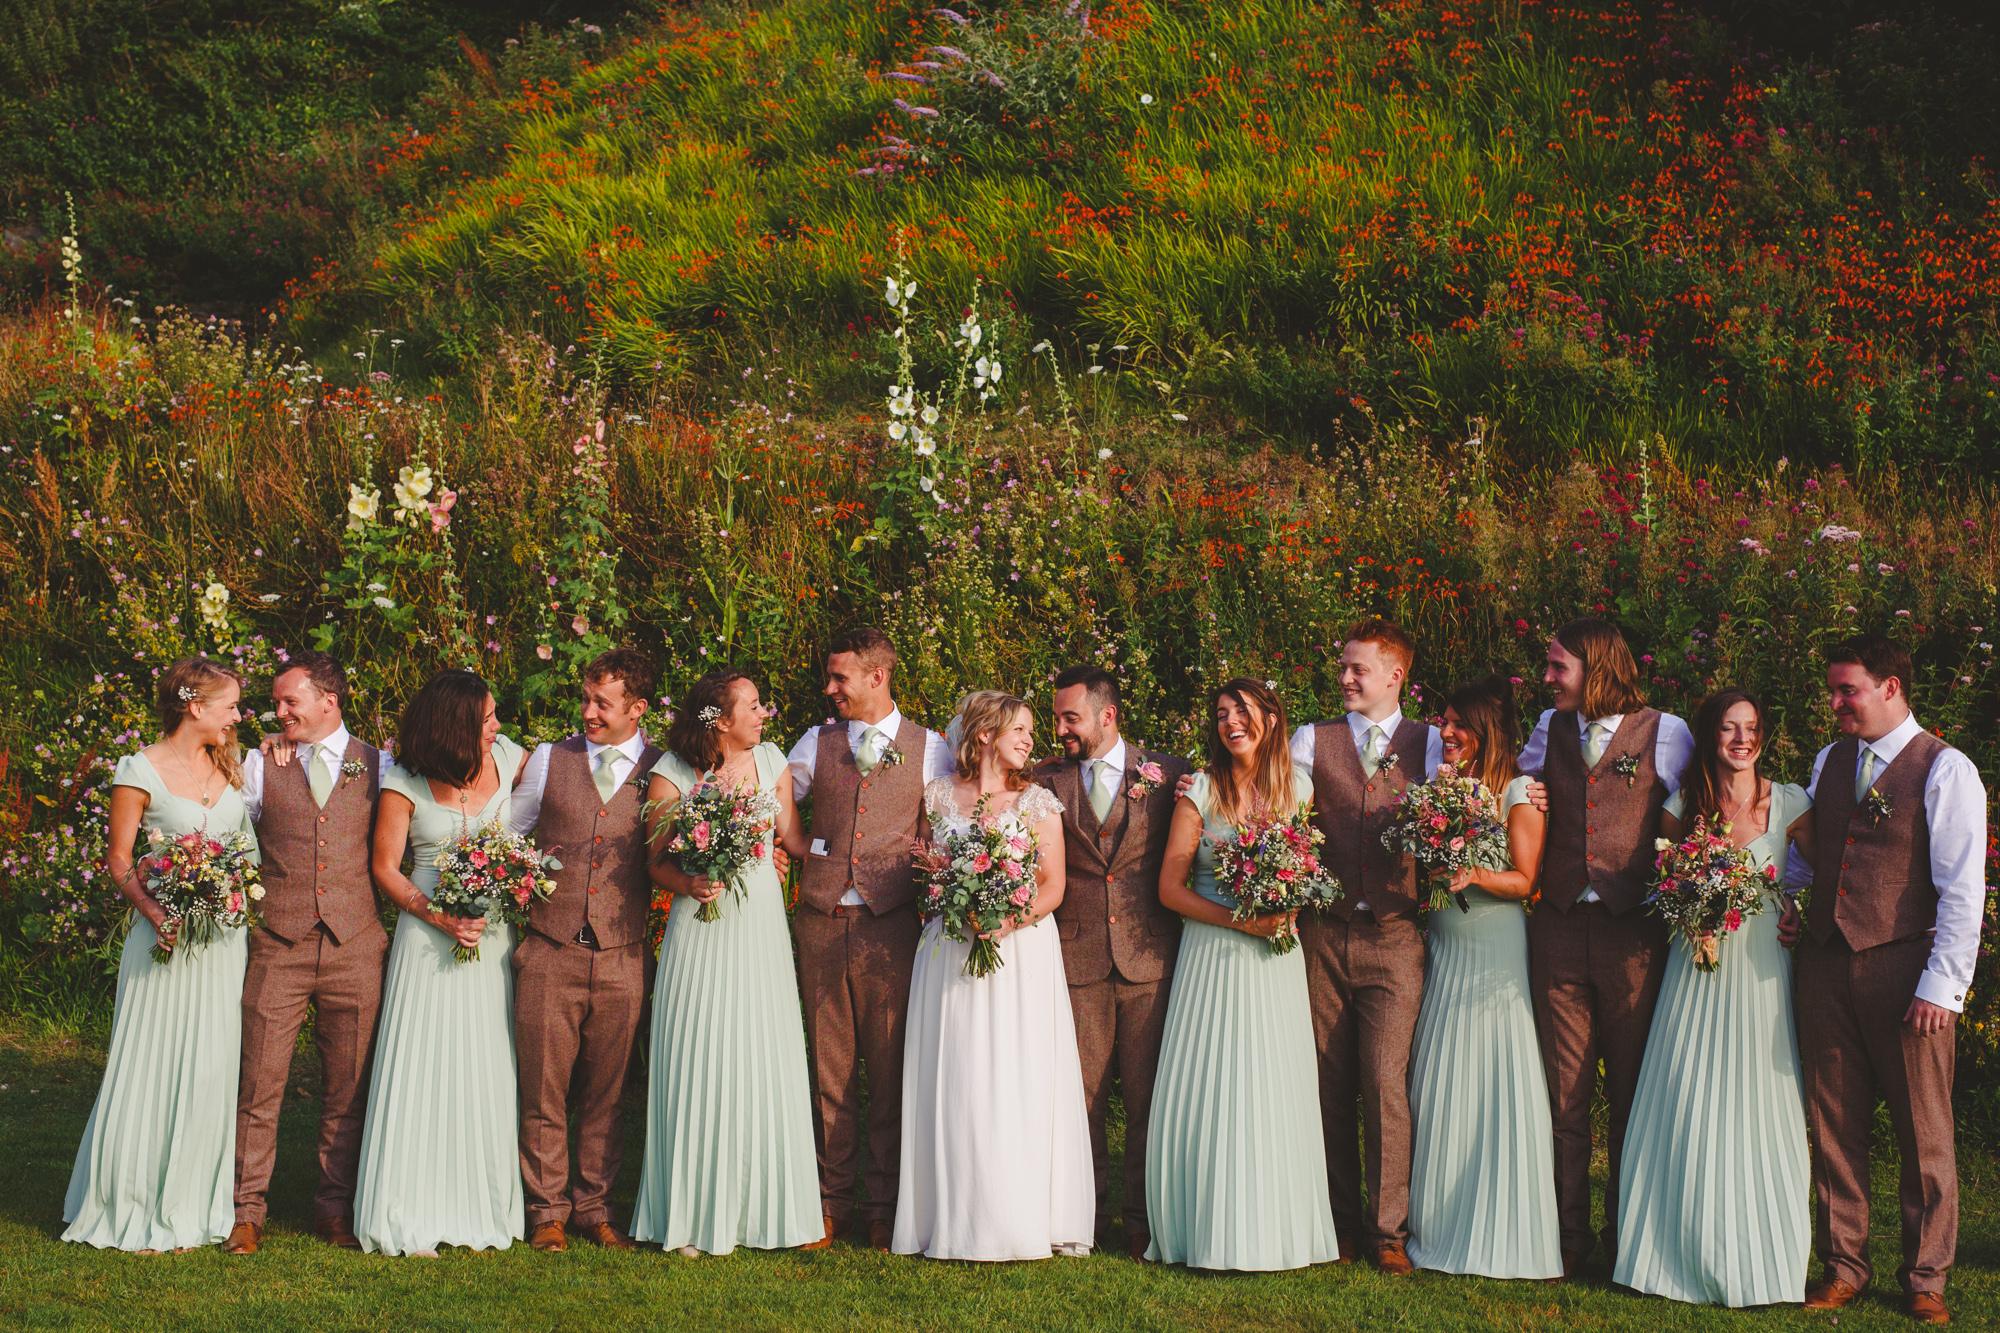 cornwall-alternative-wedding-photographer-beach-wedding-15.jpg